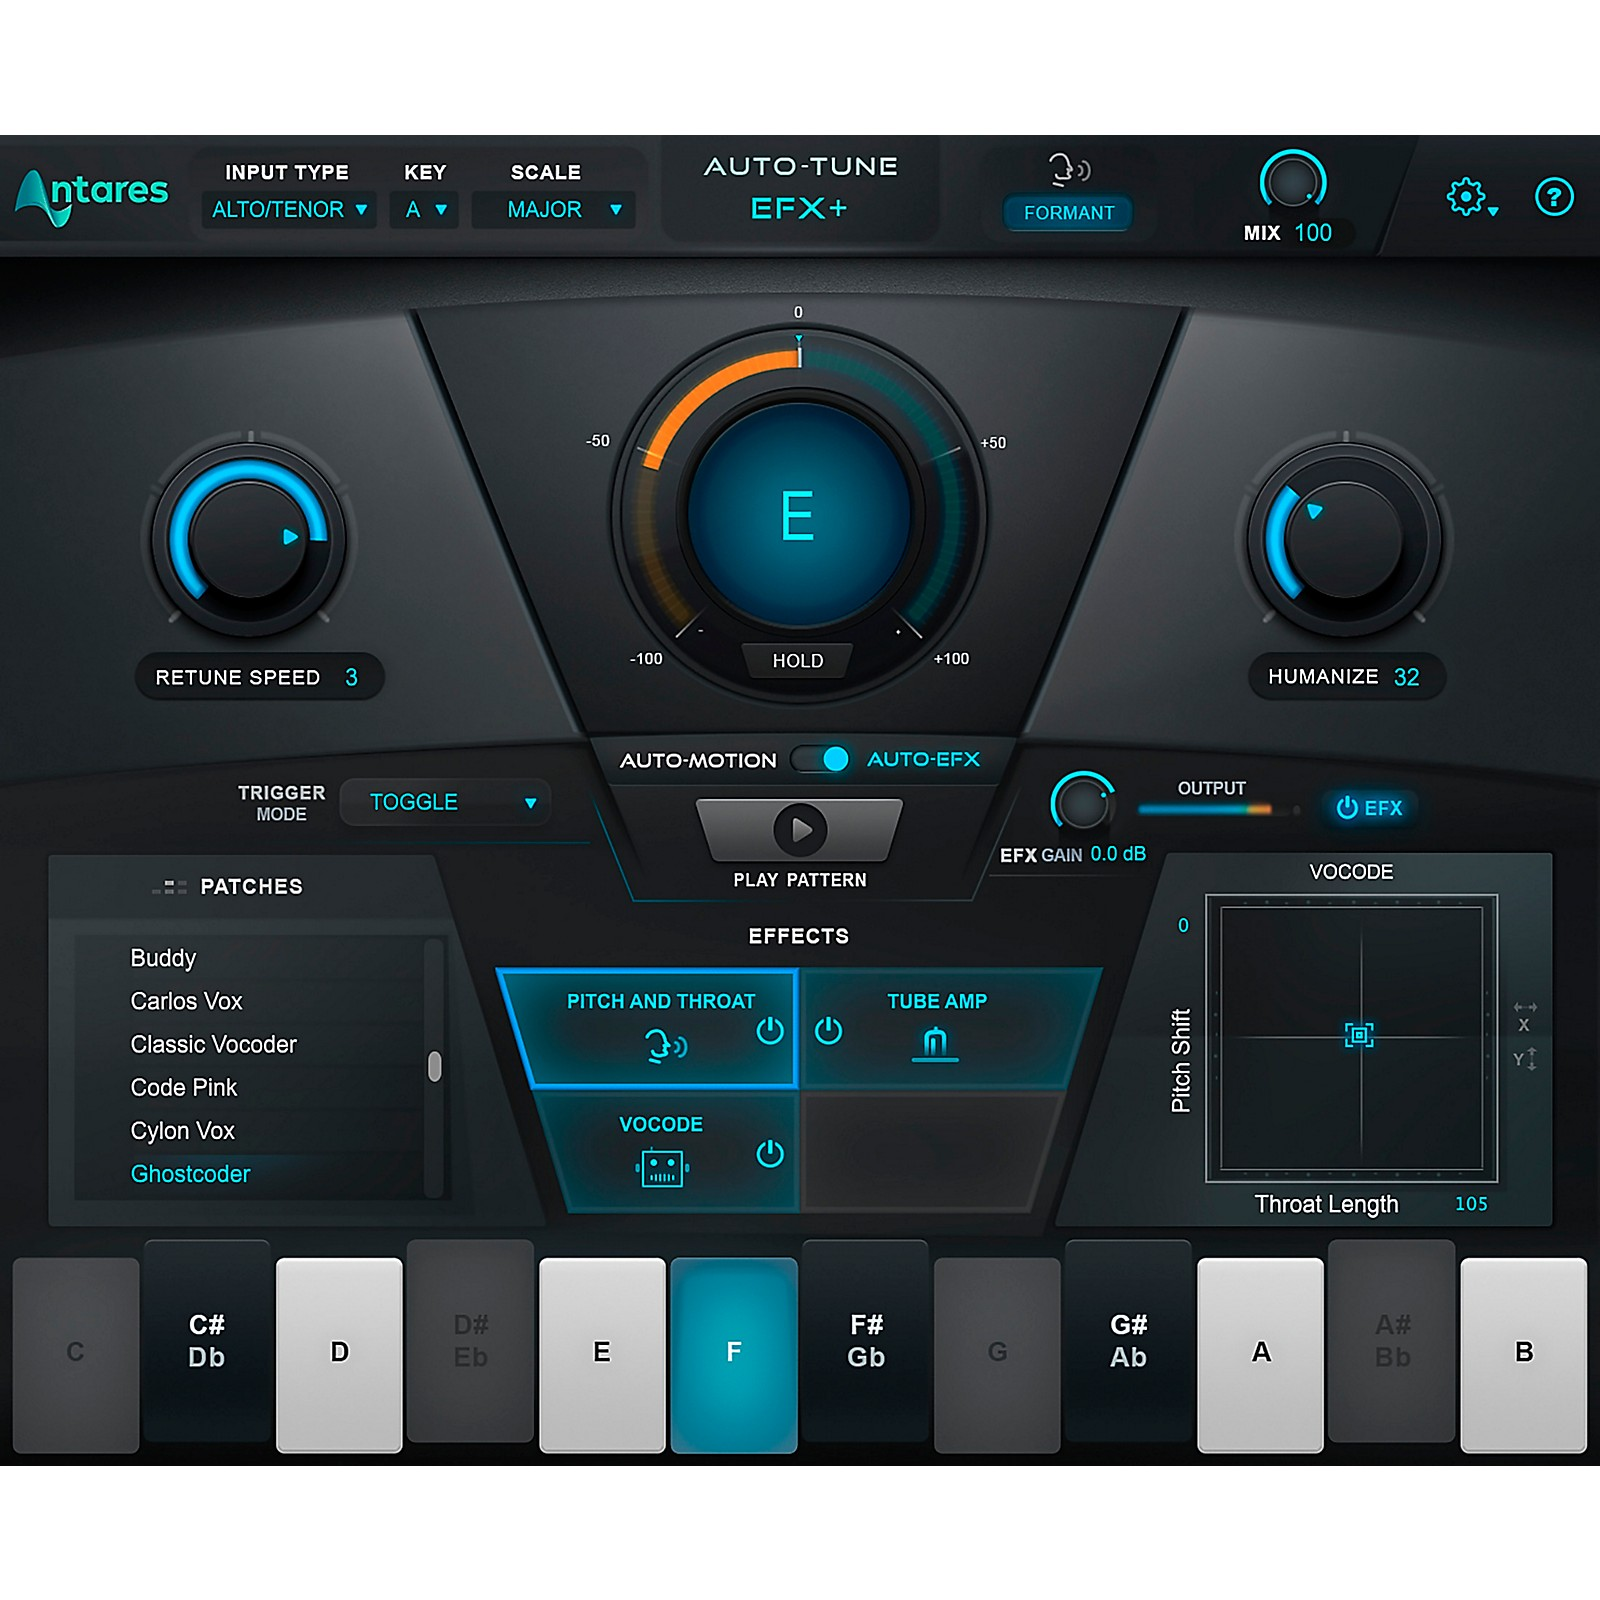 Antares Auto-Tune EFX +